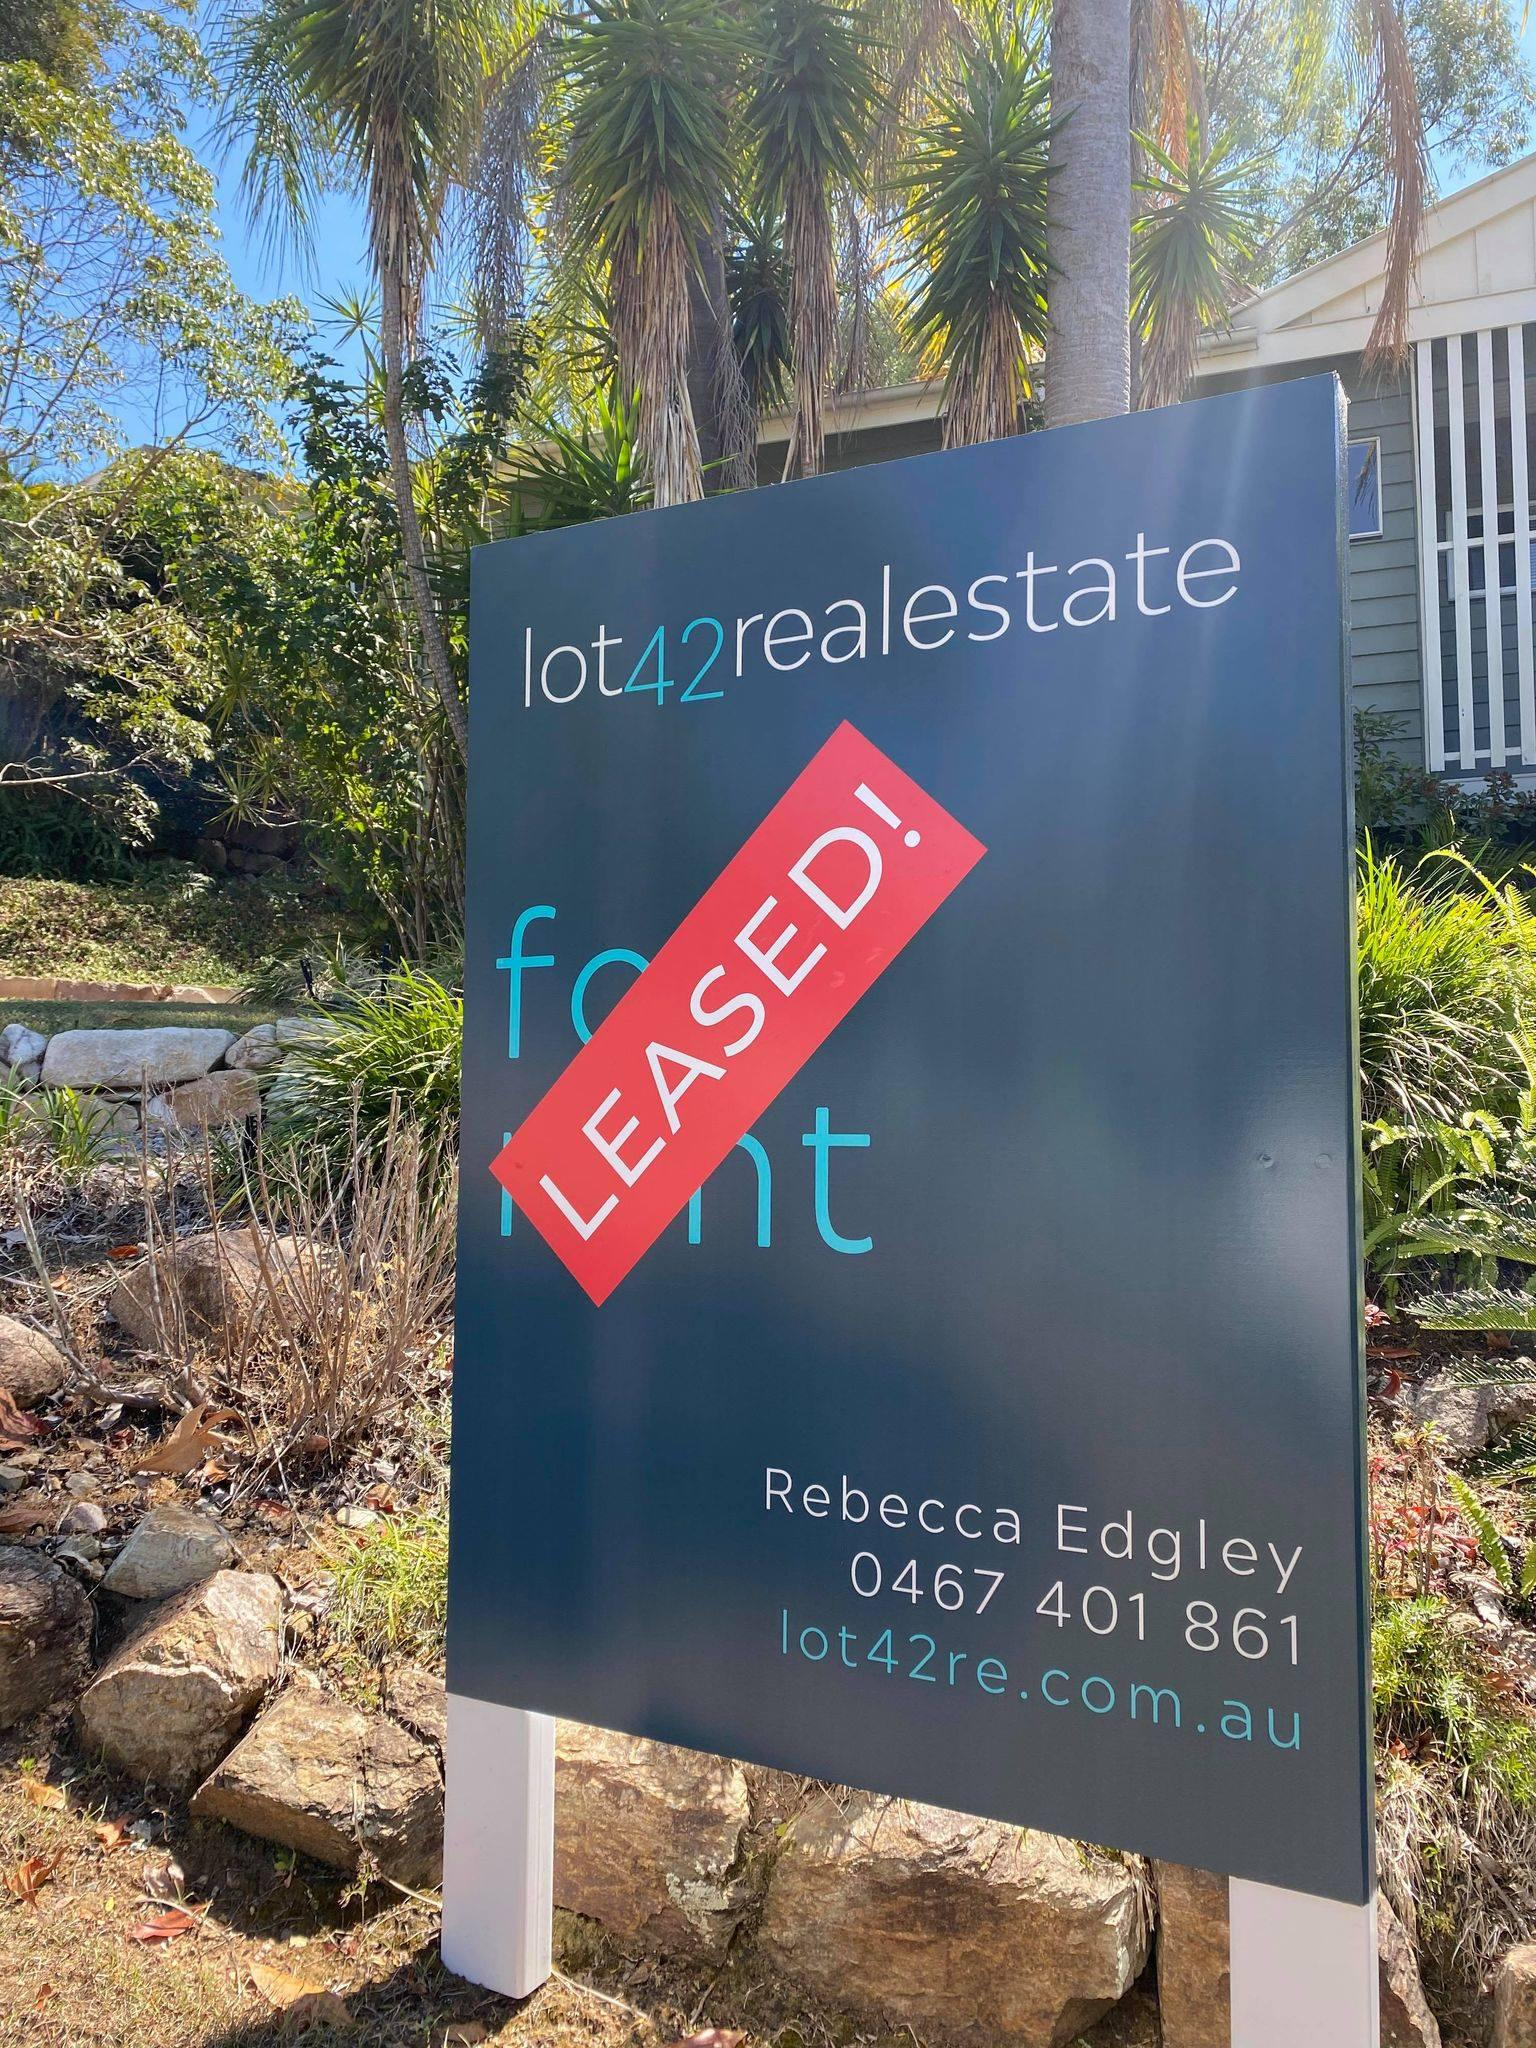 Lot 42 Real Estate